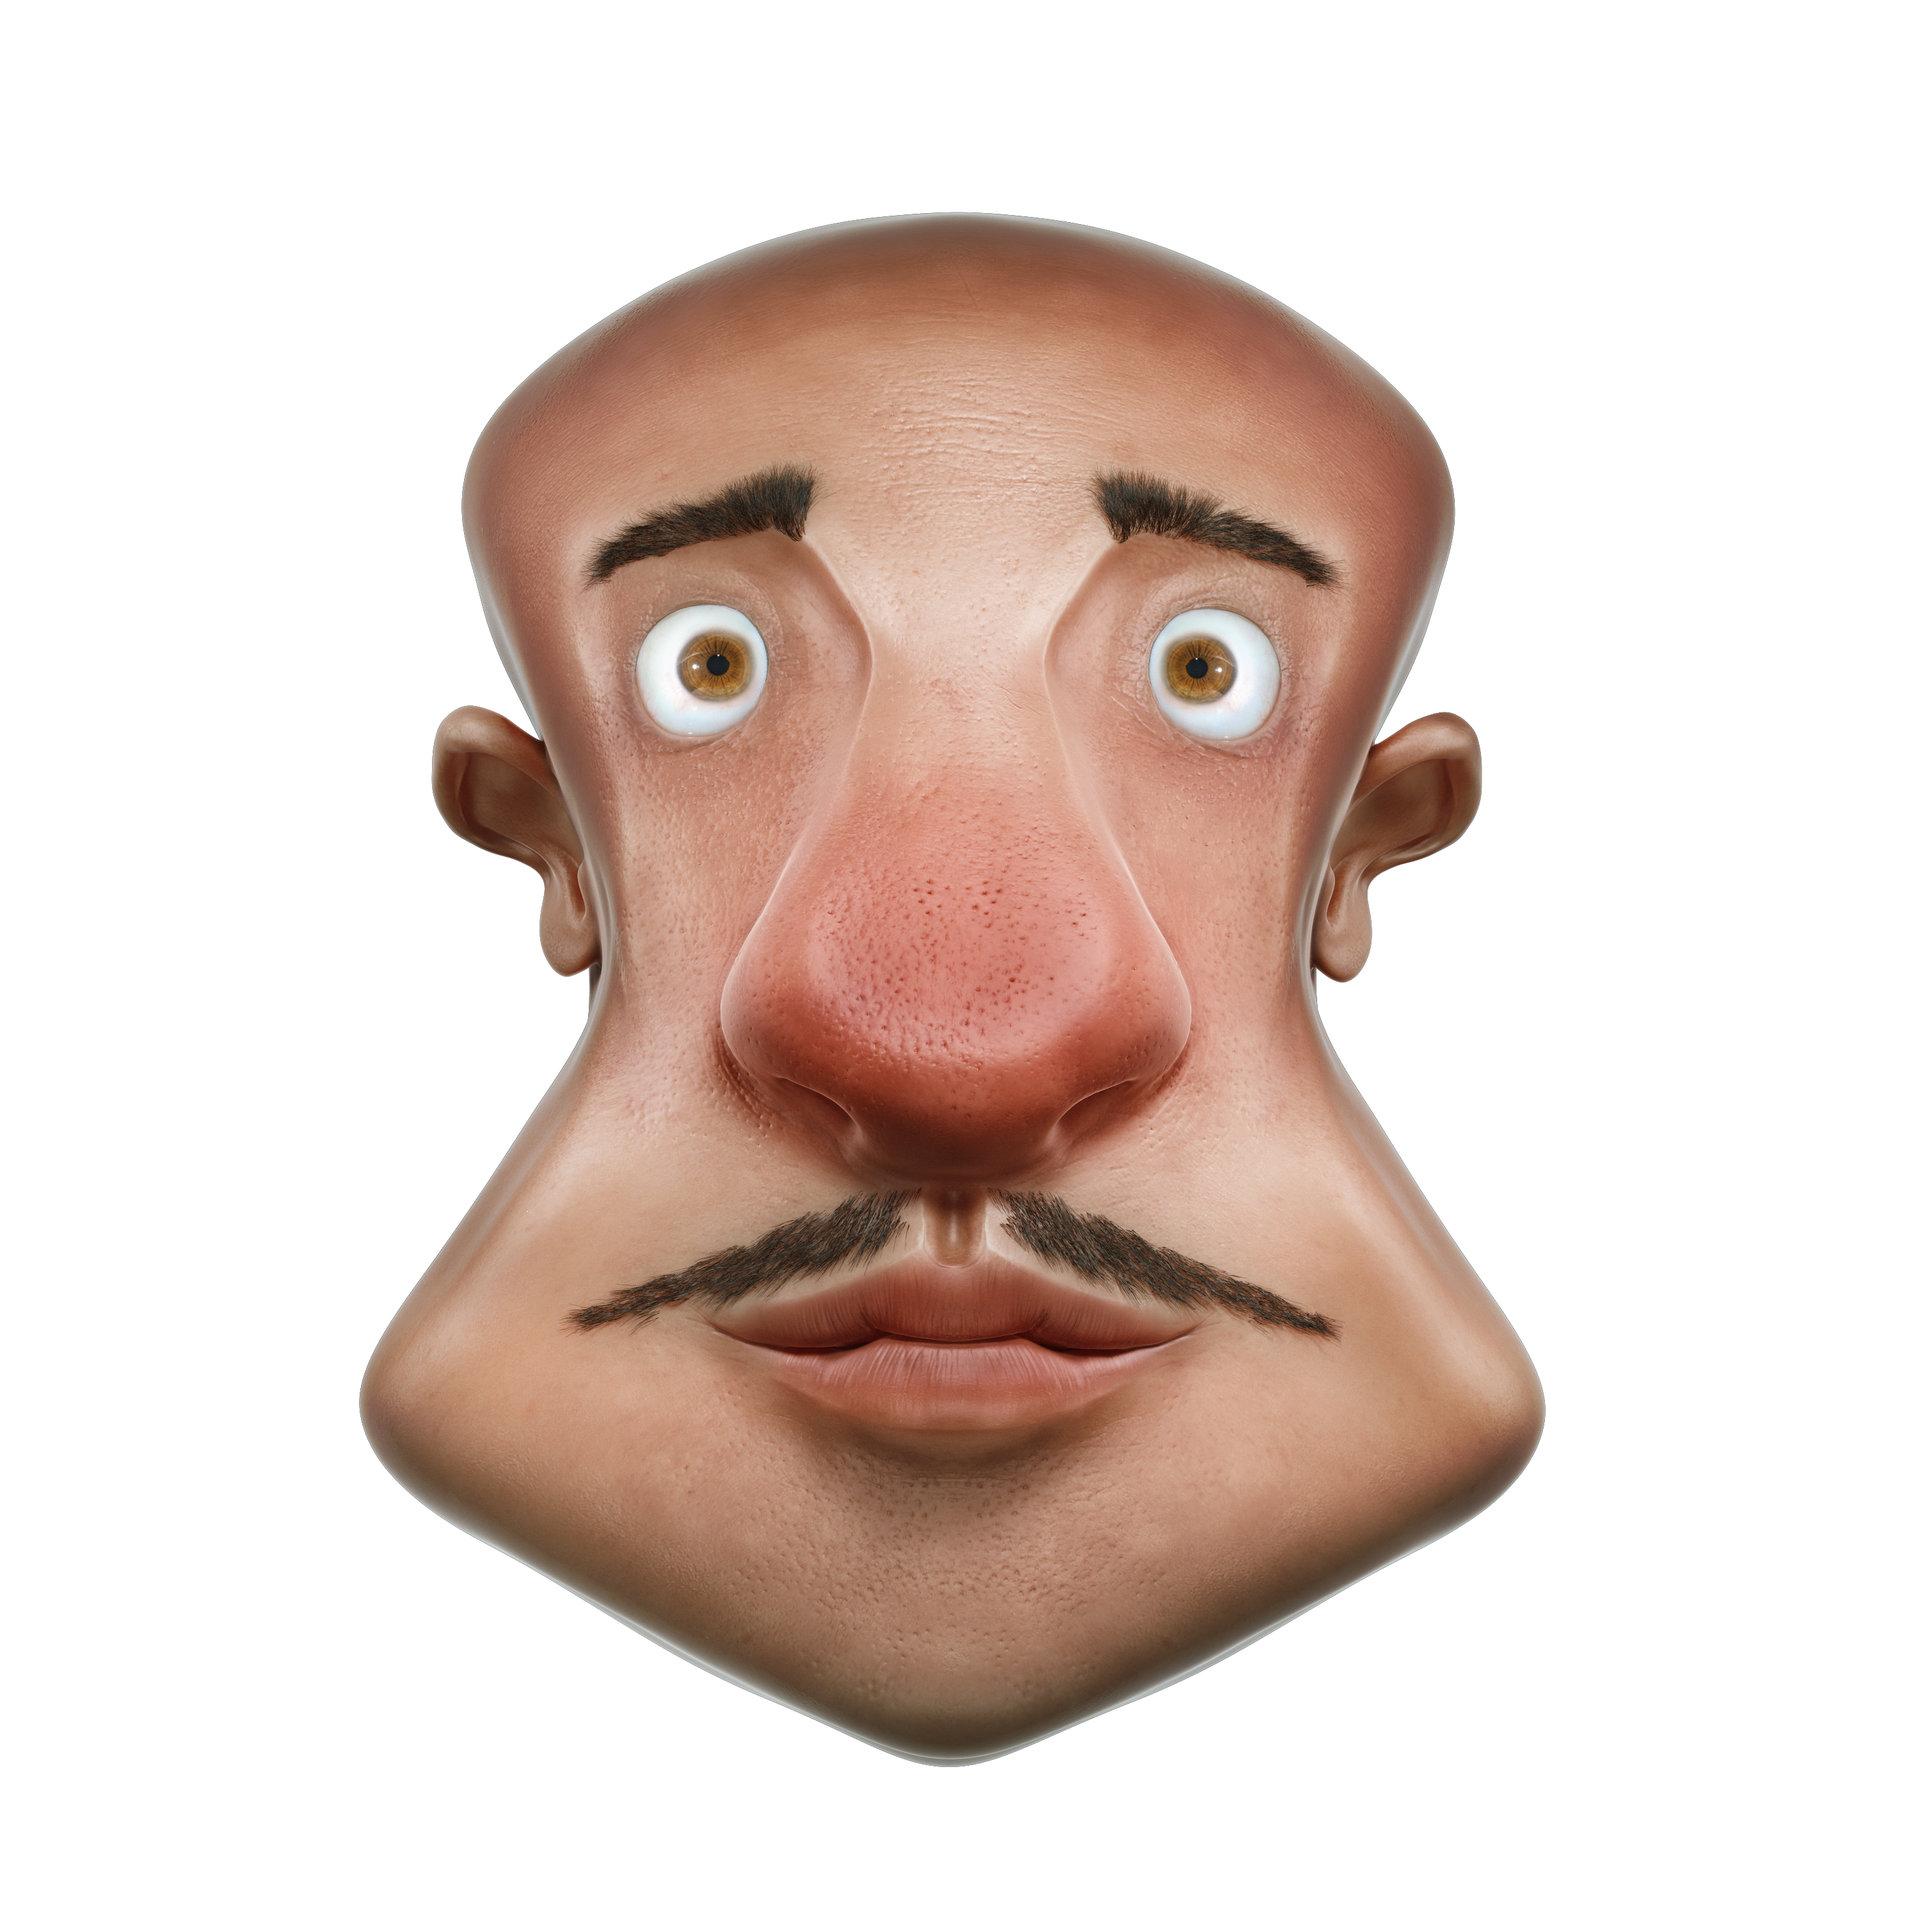 Sofian moumene character 5